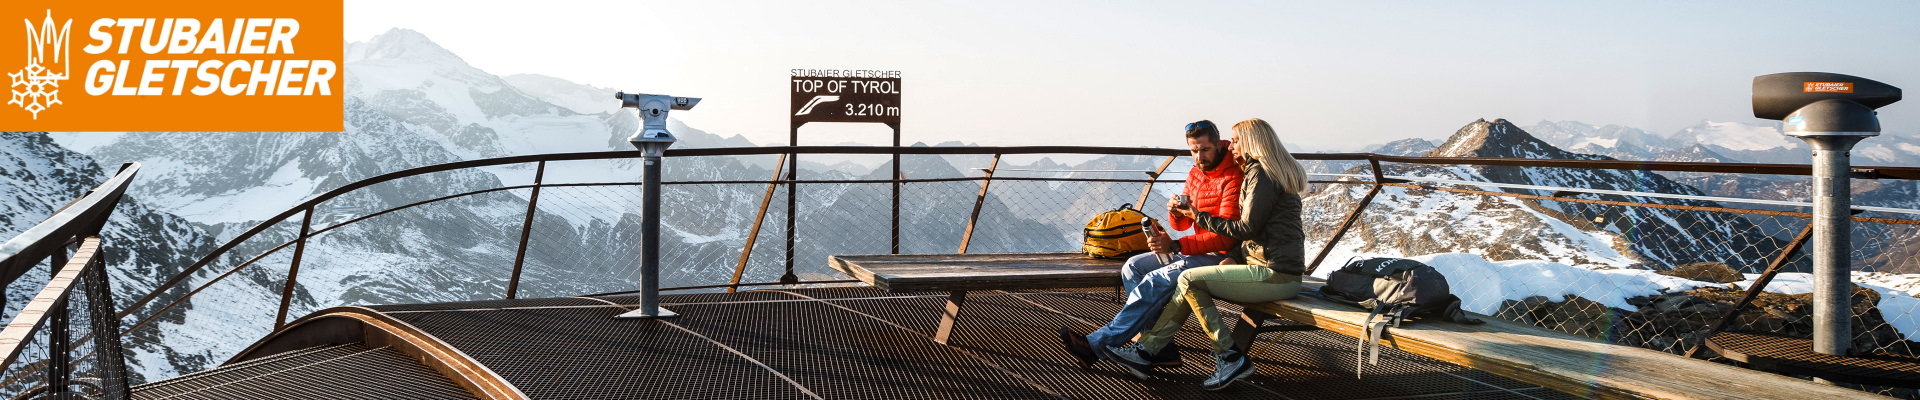 Top of Tirol viewing platform on the Stubai Glacier